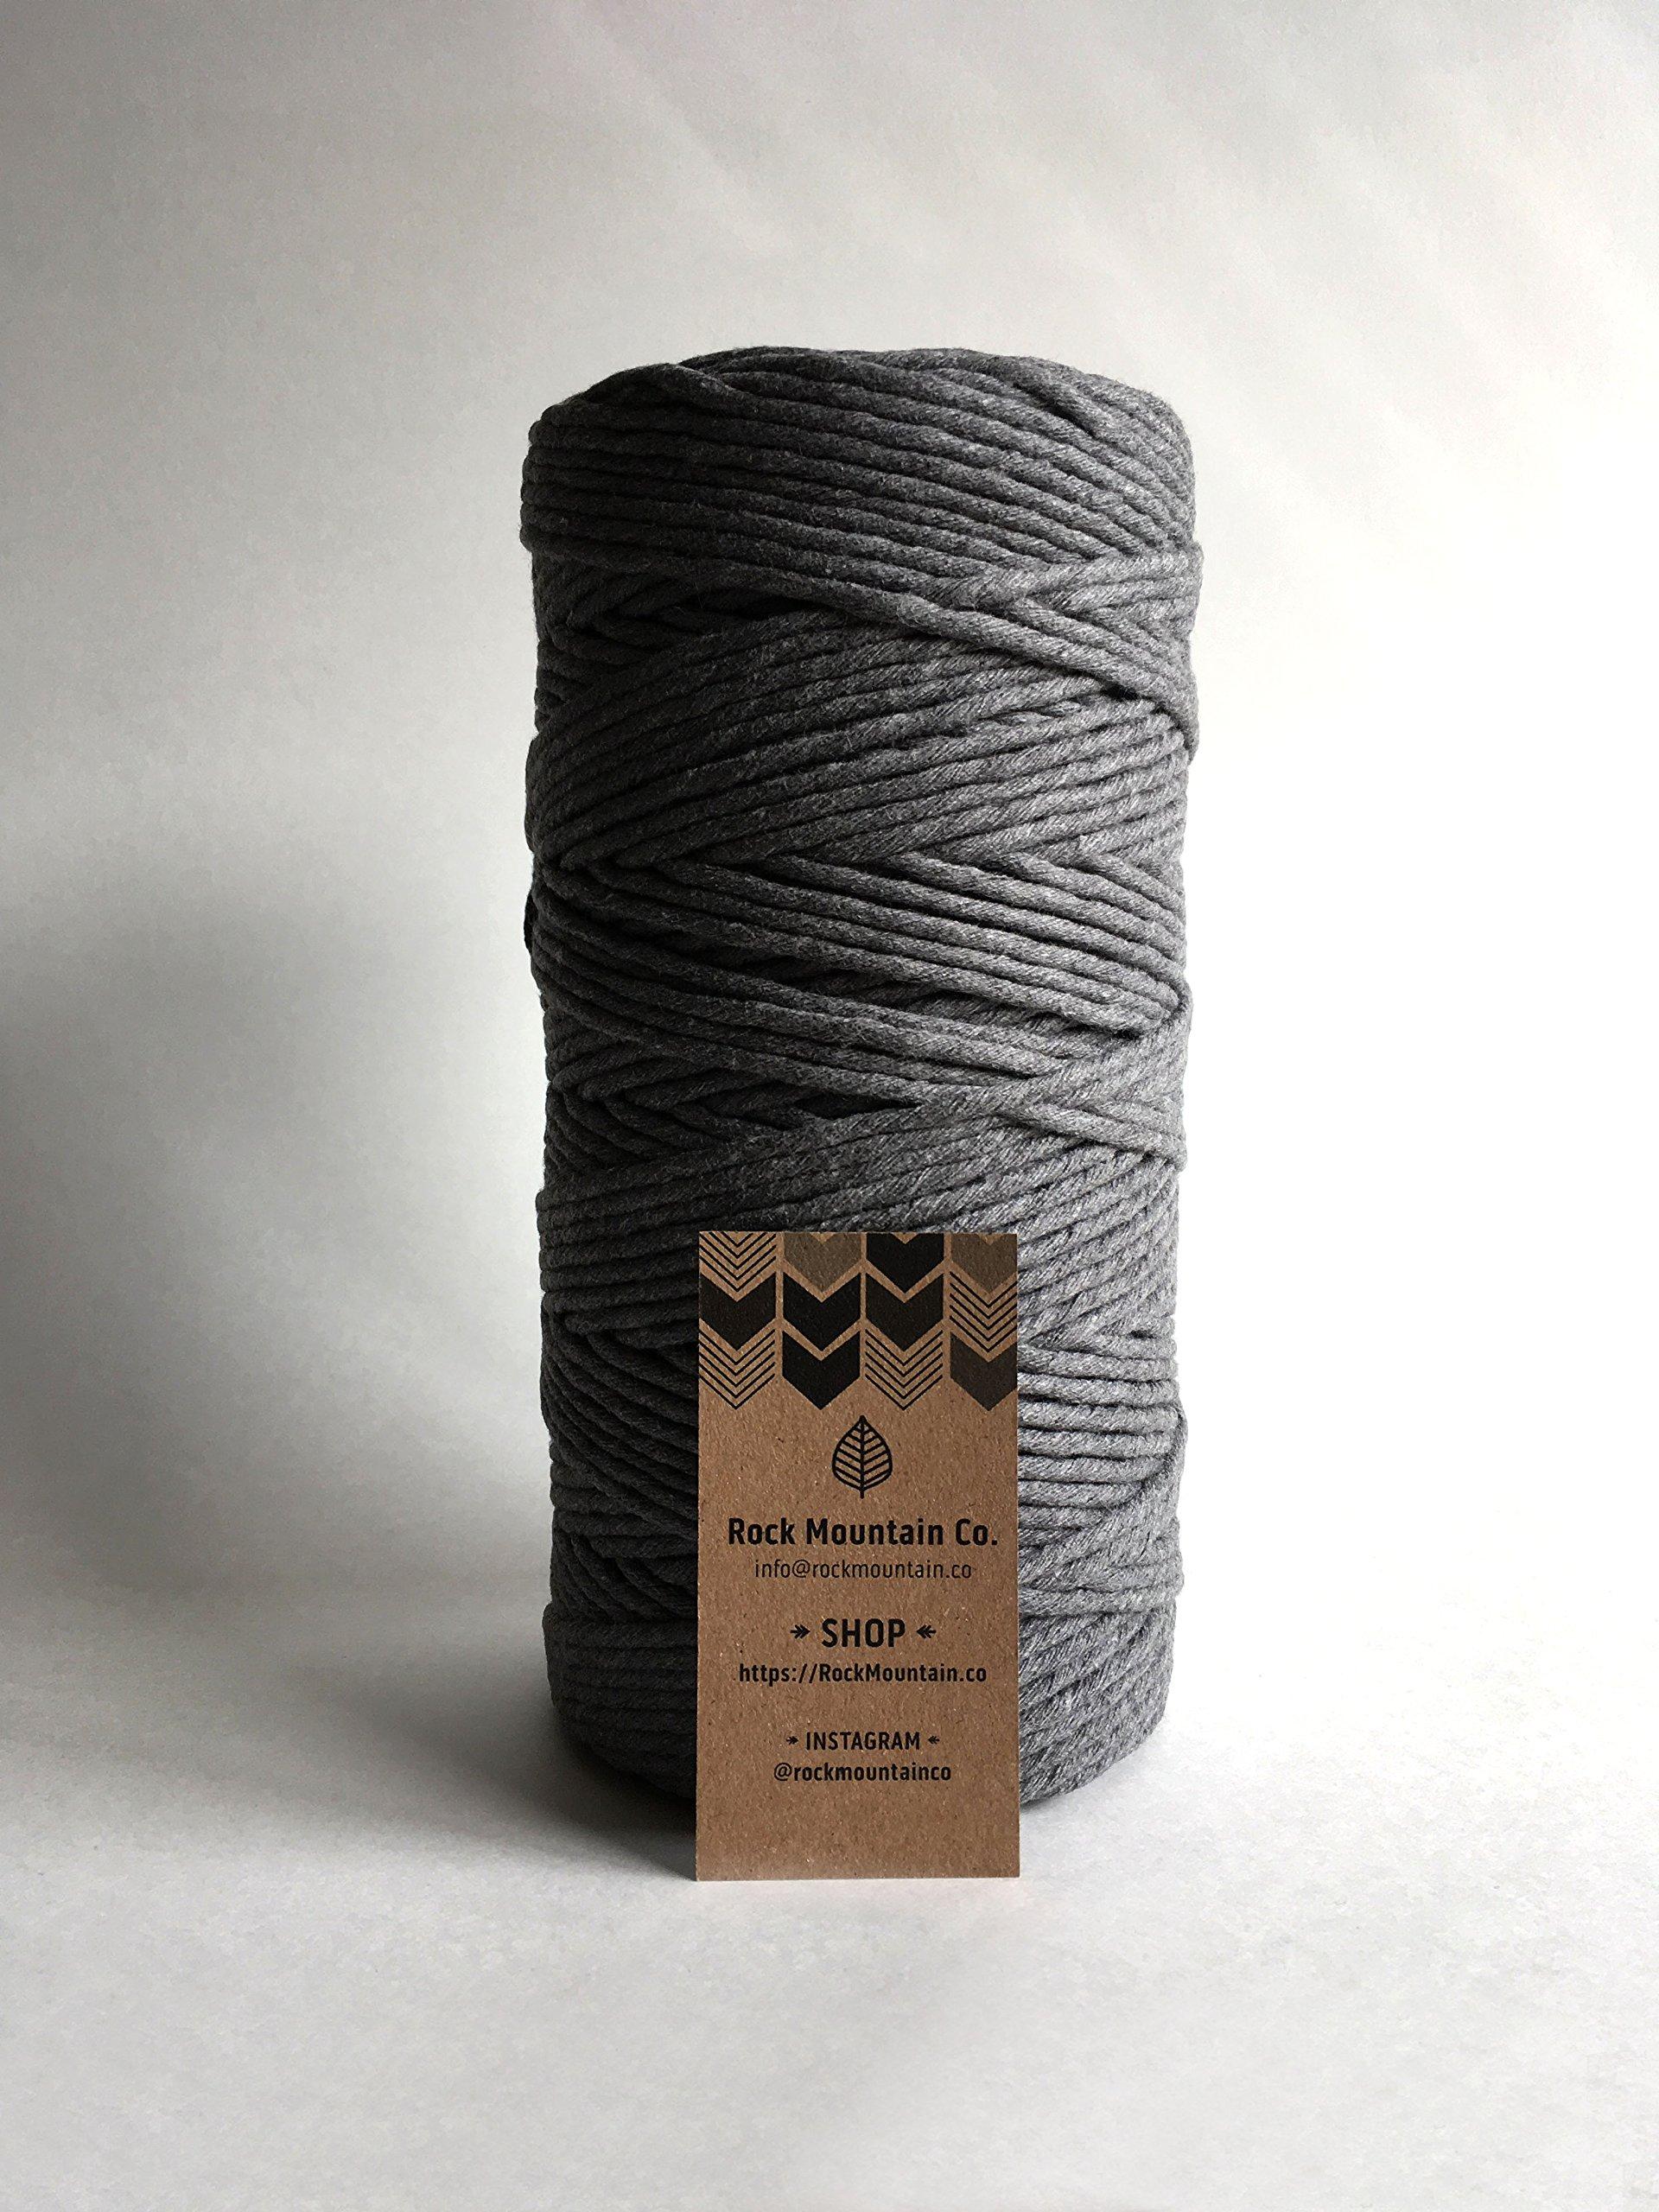 Gray Macrame Cord / 4mm Single Strand Cotton Fiber Art Rope/Earl Gray/Charcoal by Rock Mountain Co (Image #5)